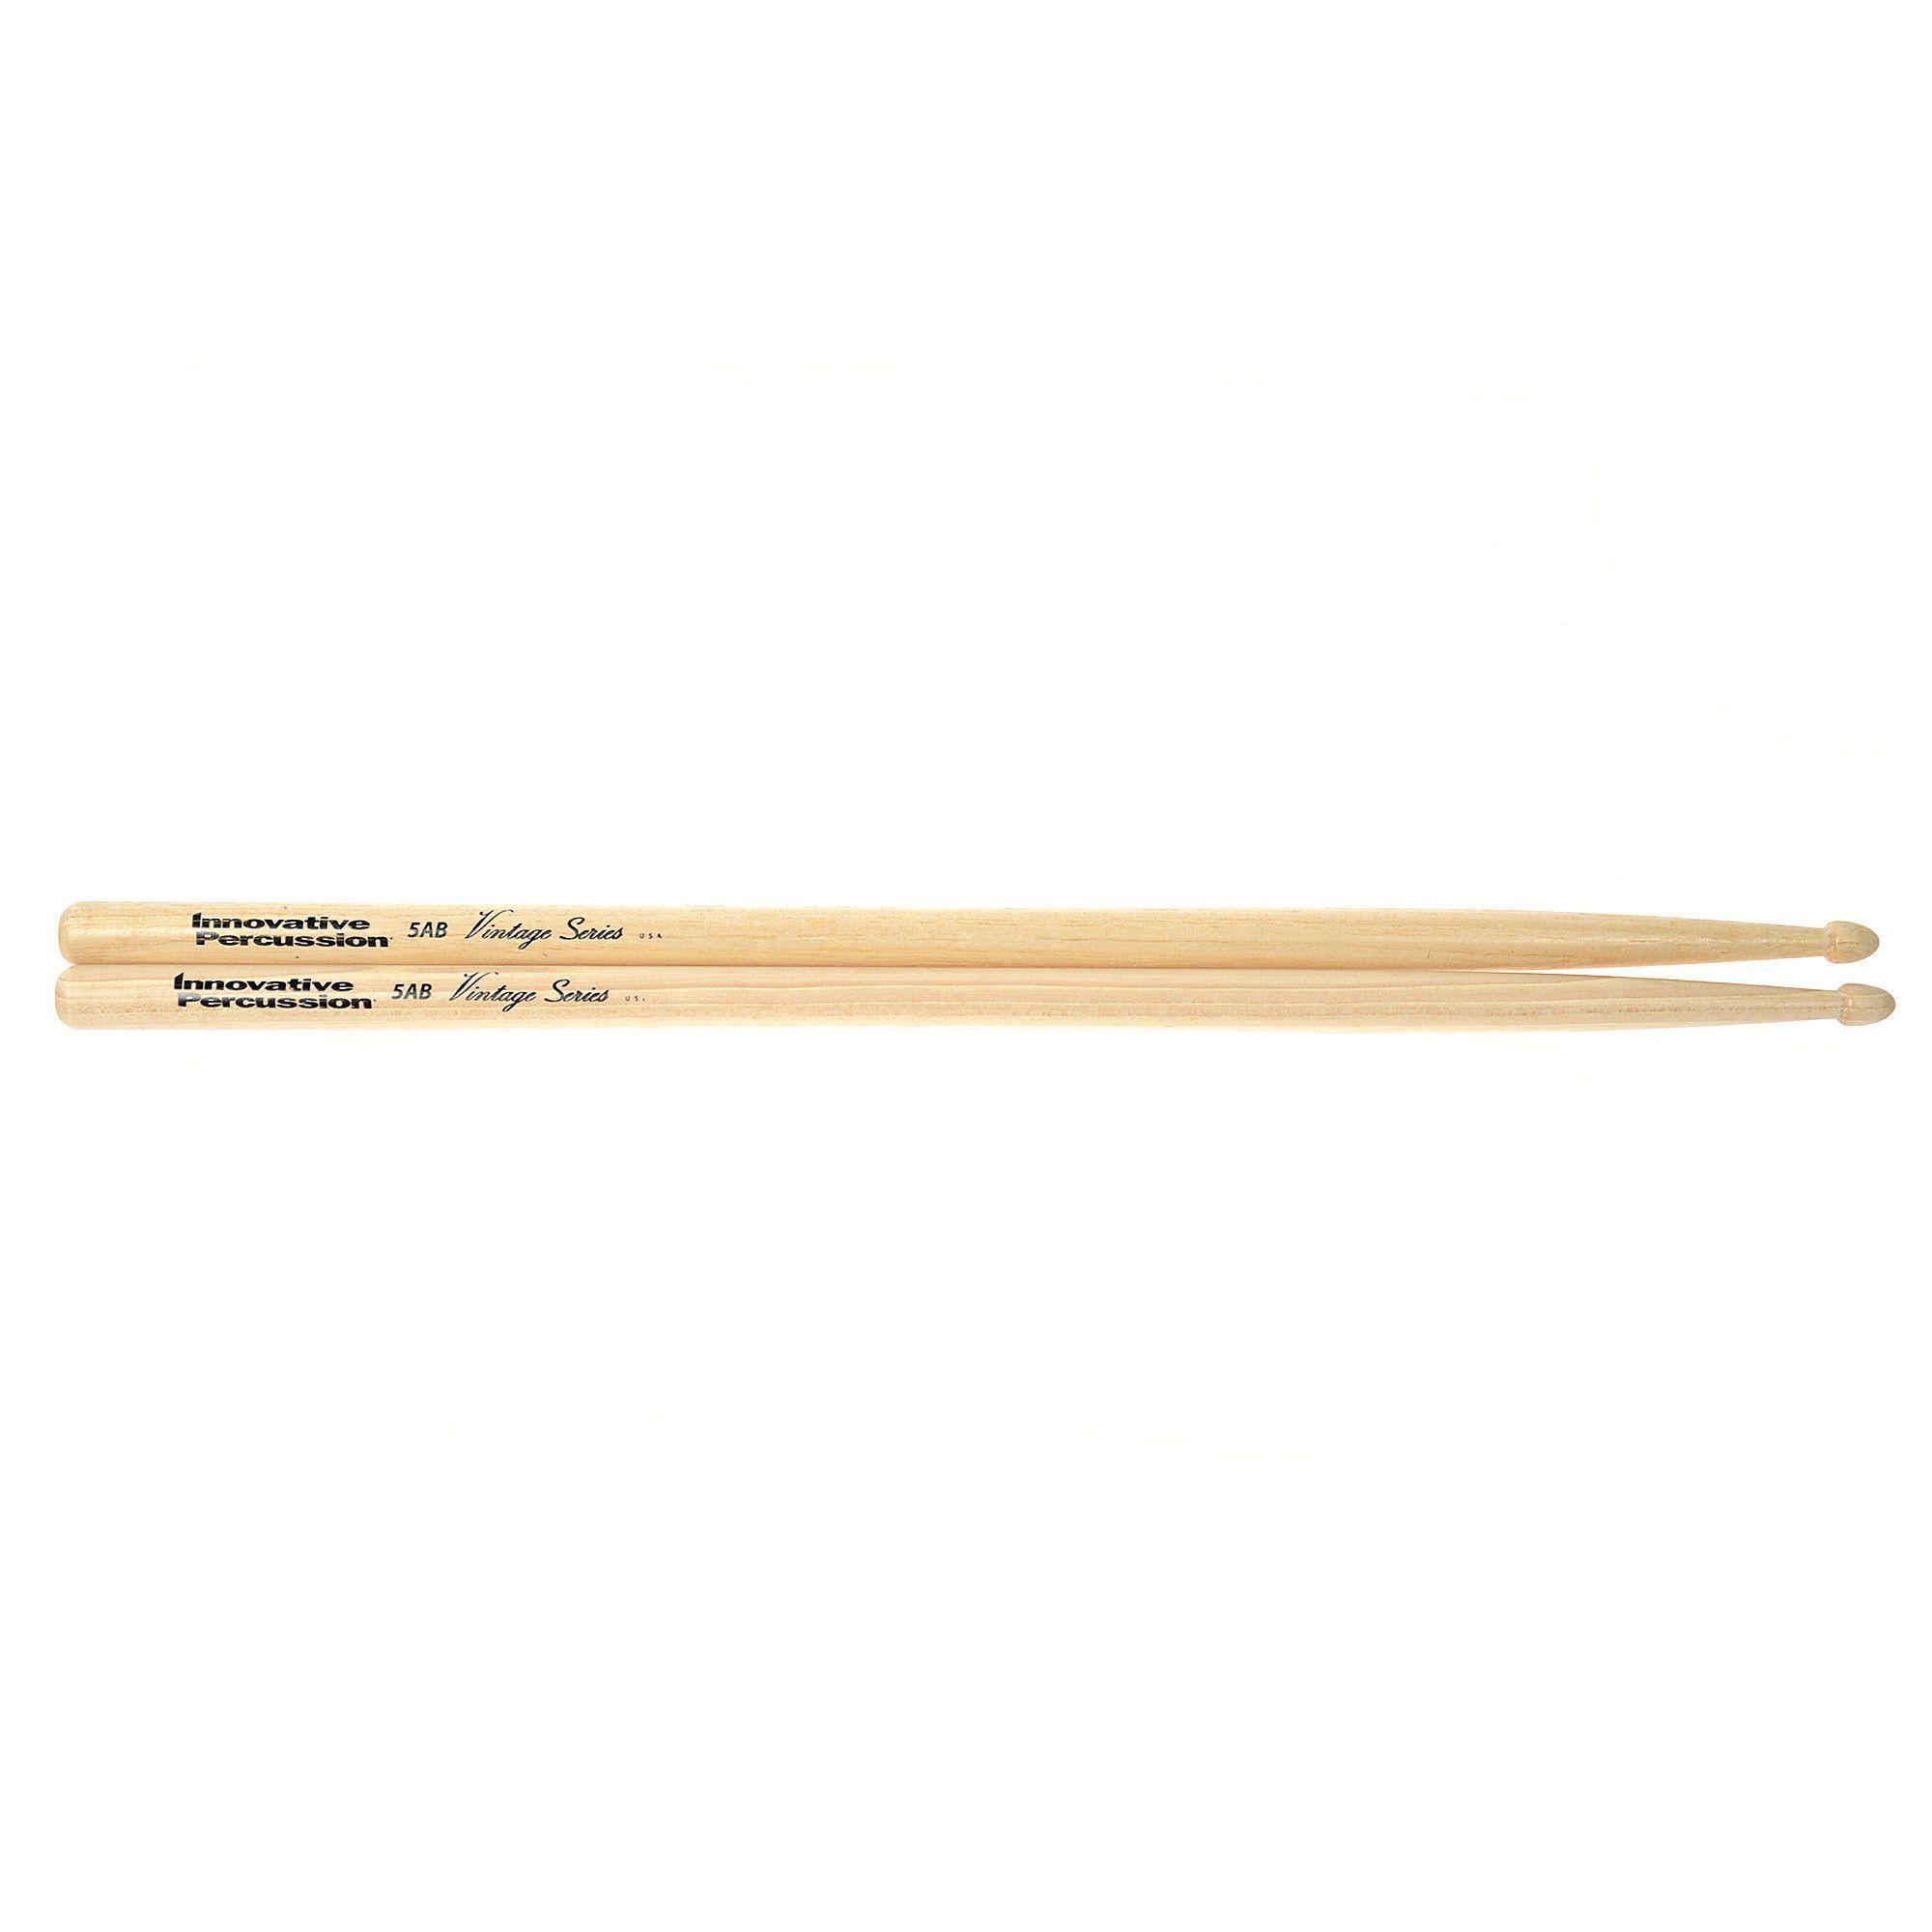 Innovative Percussion Vintage Series 5AB Hickory Sticks